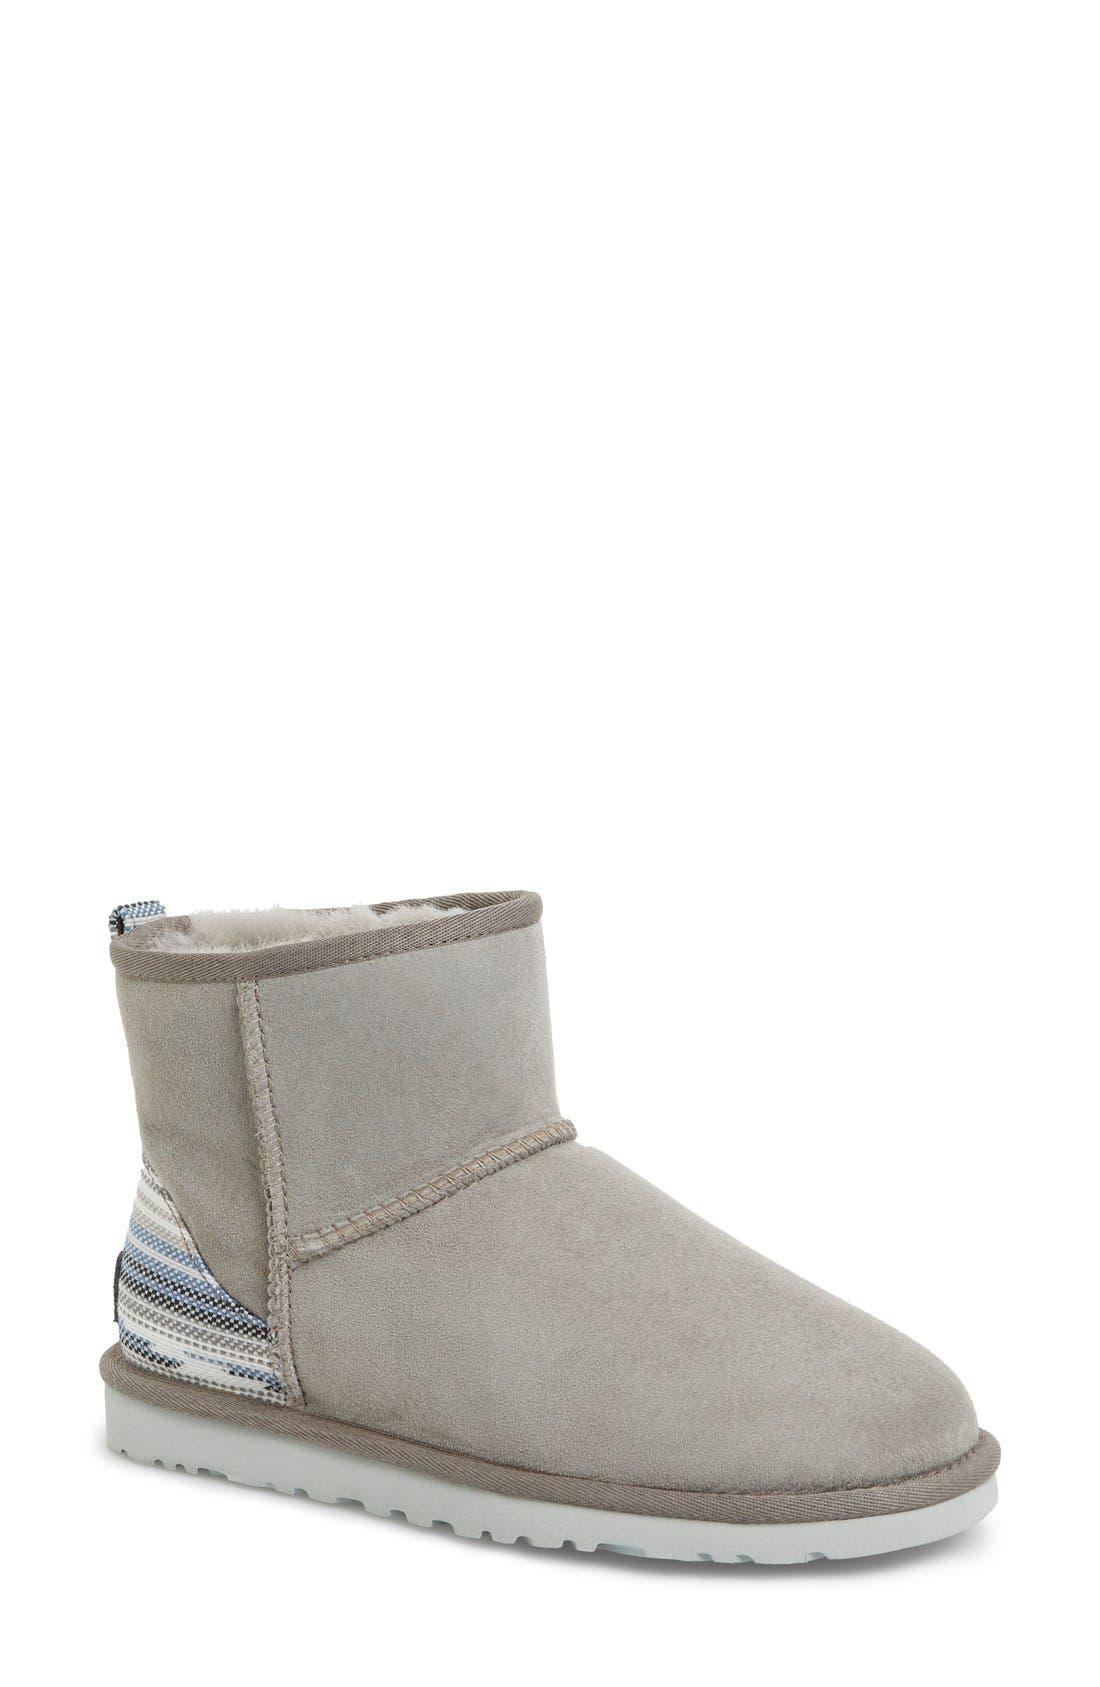 'Classic Mini Serape' Genuine Shearling Lined Boot, Main, color, 024